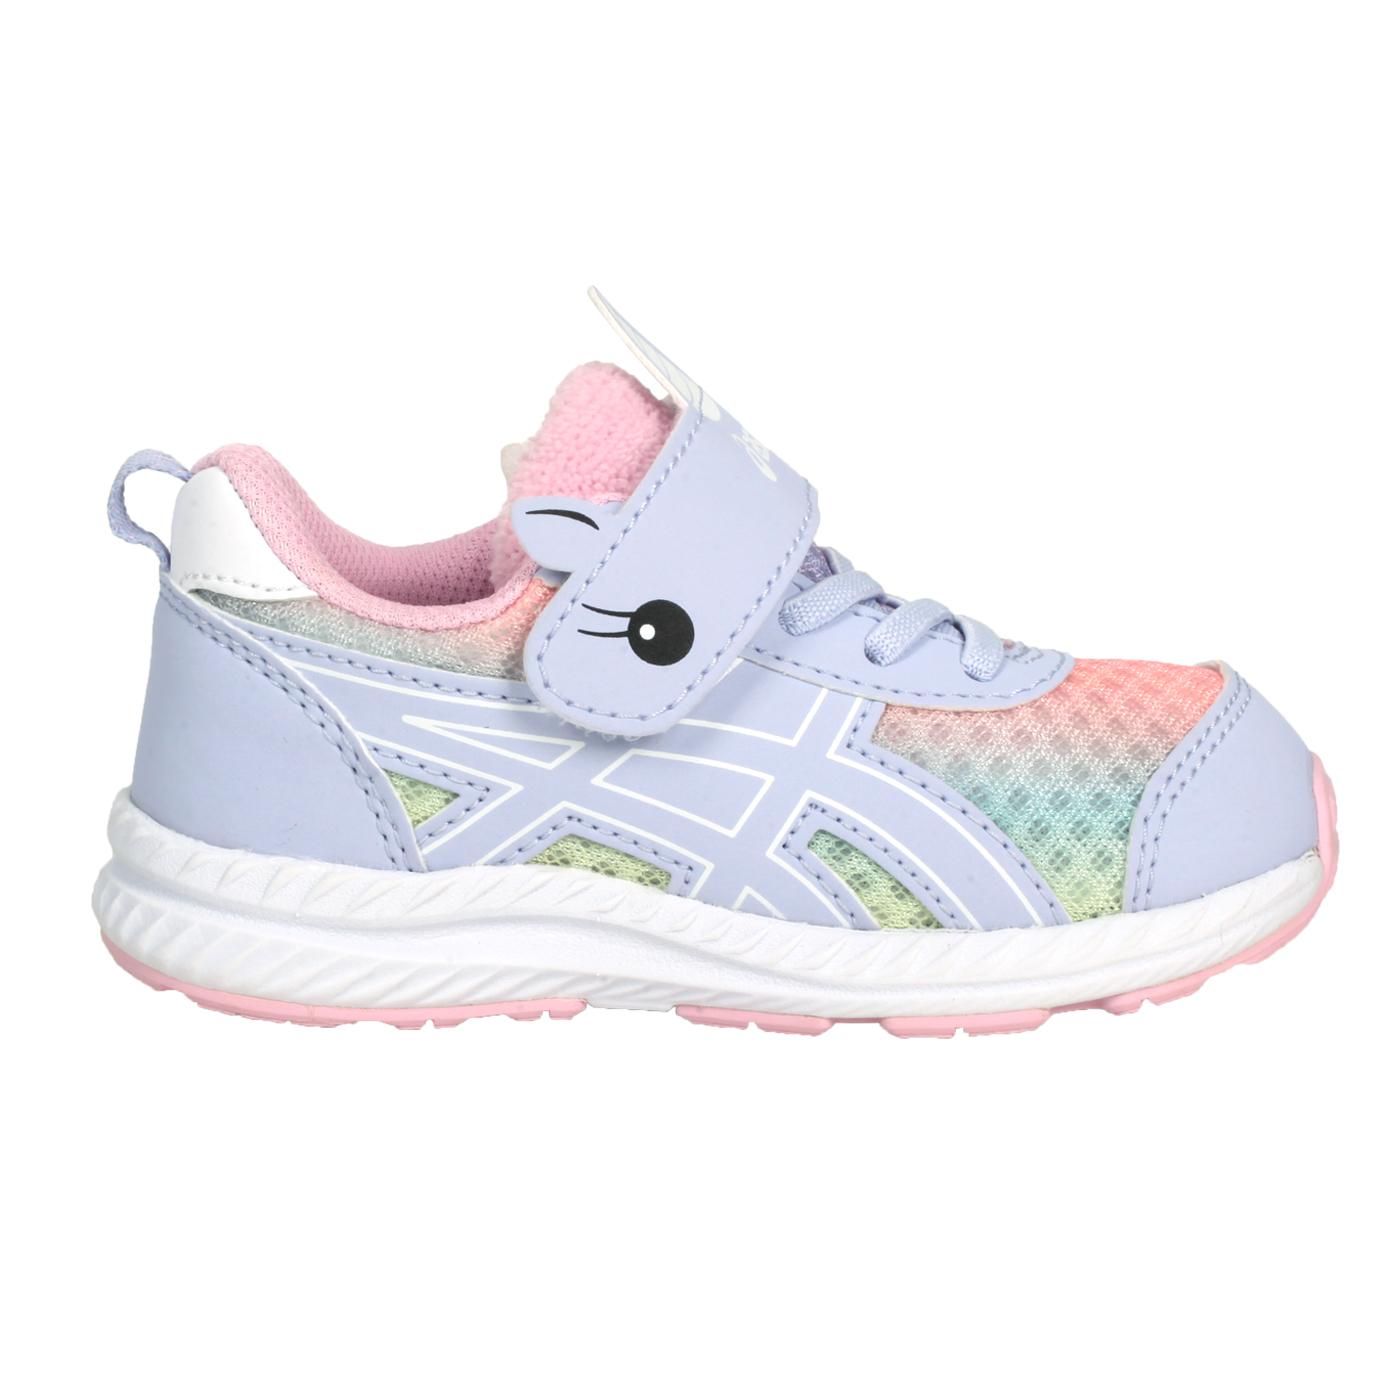 ASICS 小童慢跑鞋  @CONTEND 7 TS SCHOOL YARD@1014A202-405 - 紫粉橘黃藍